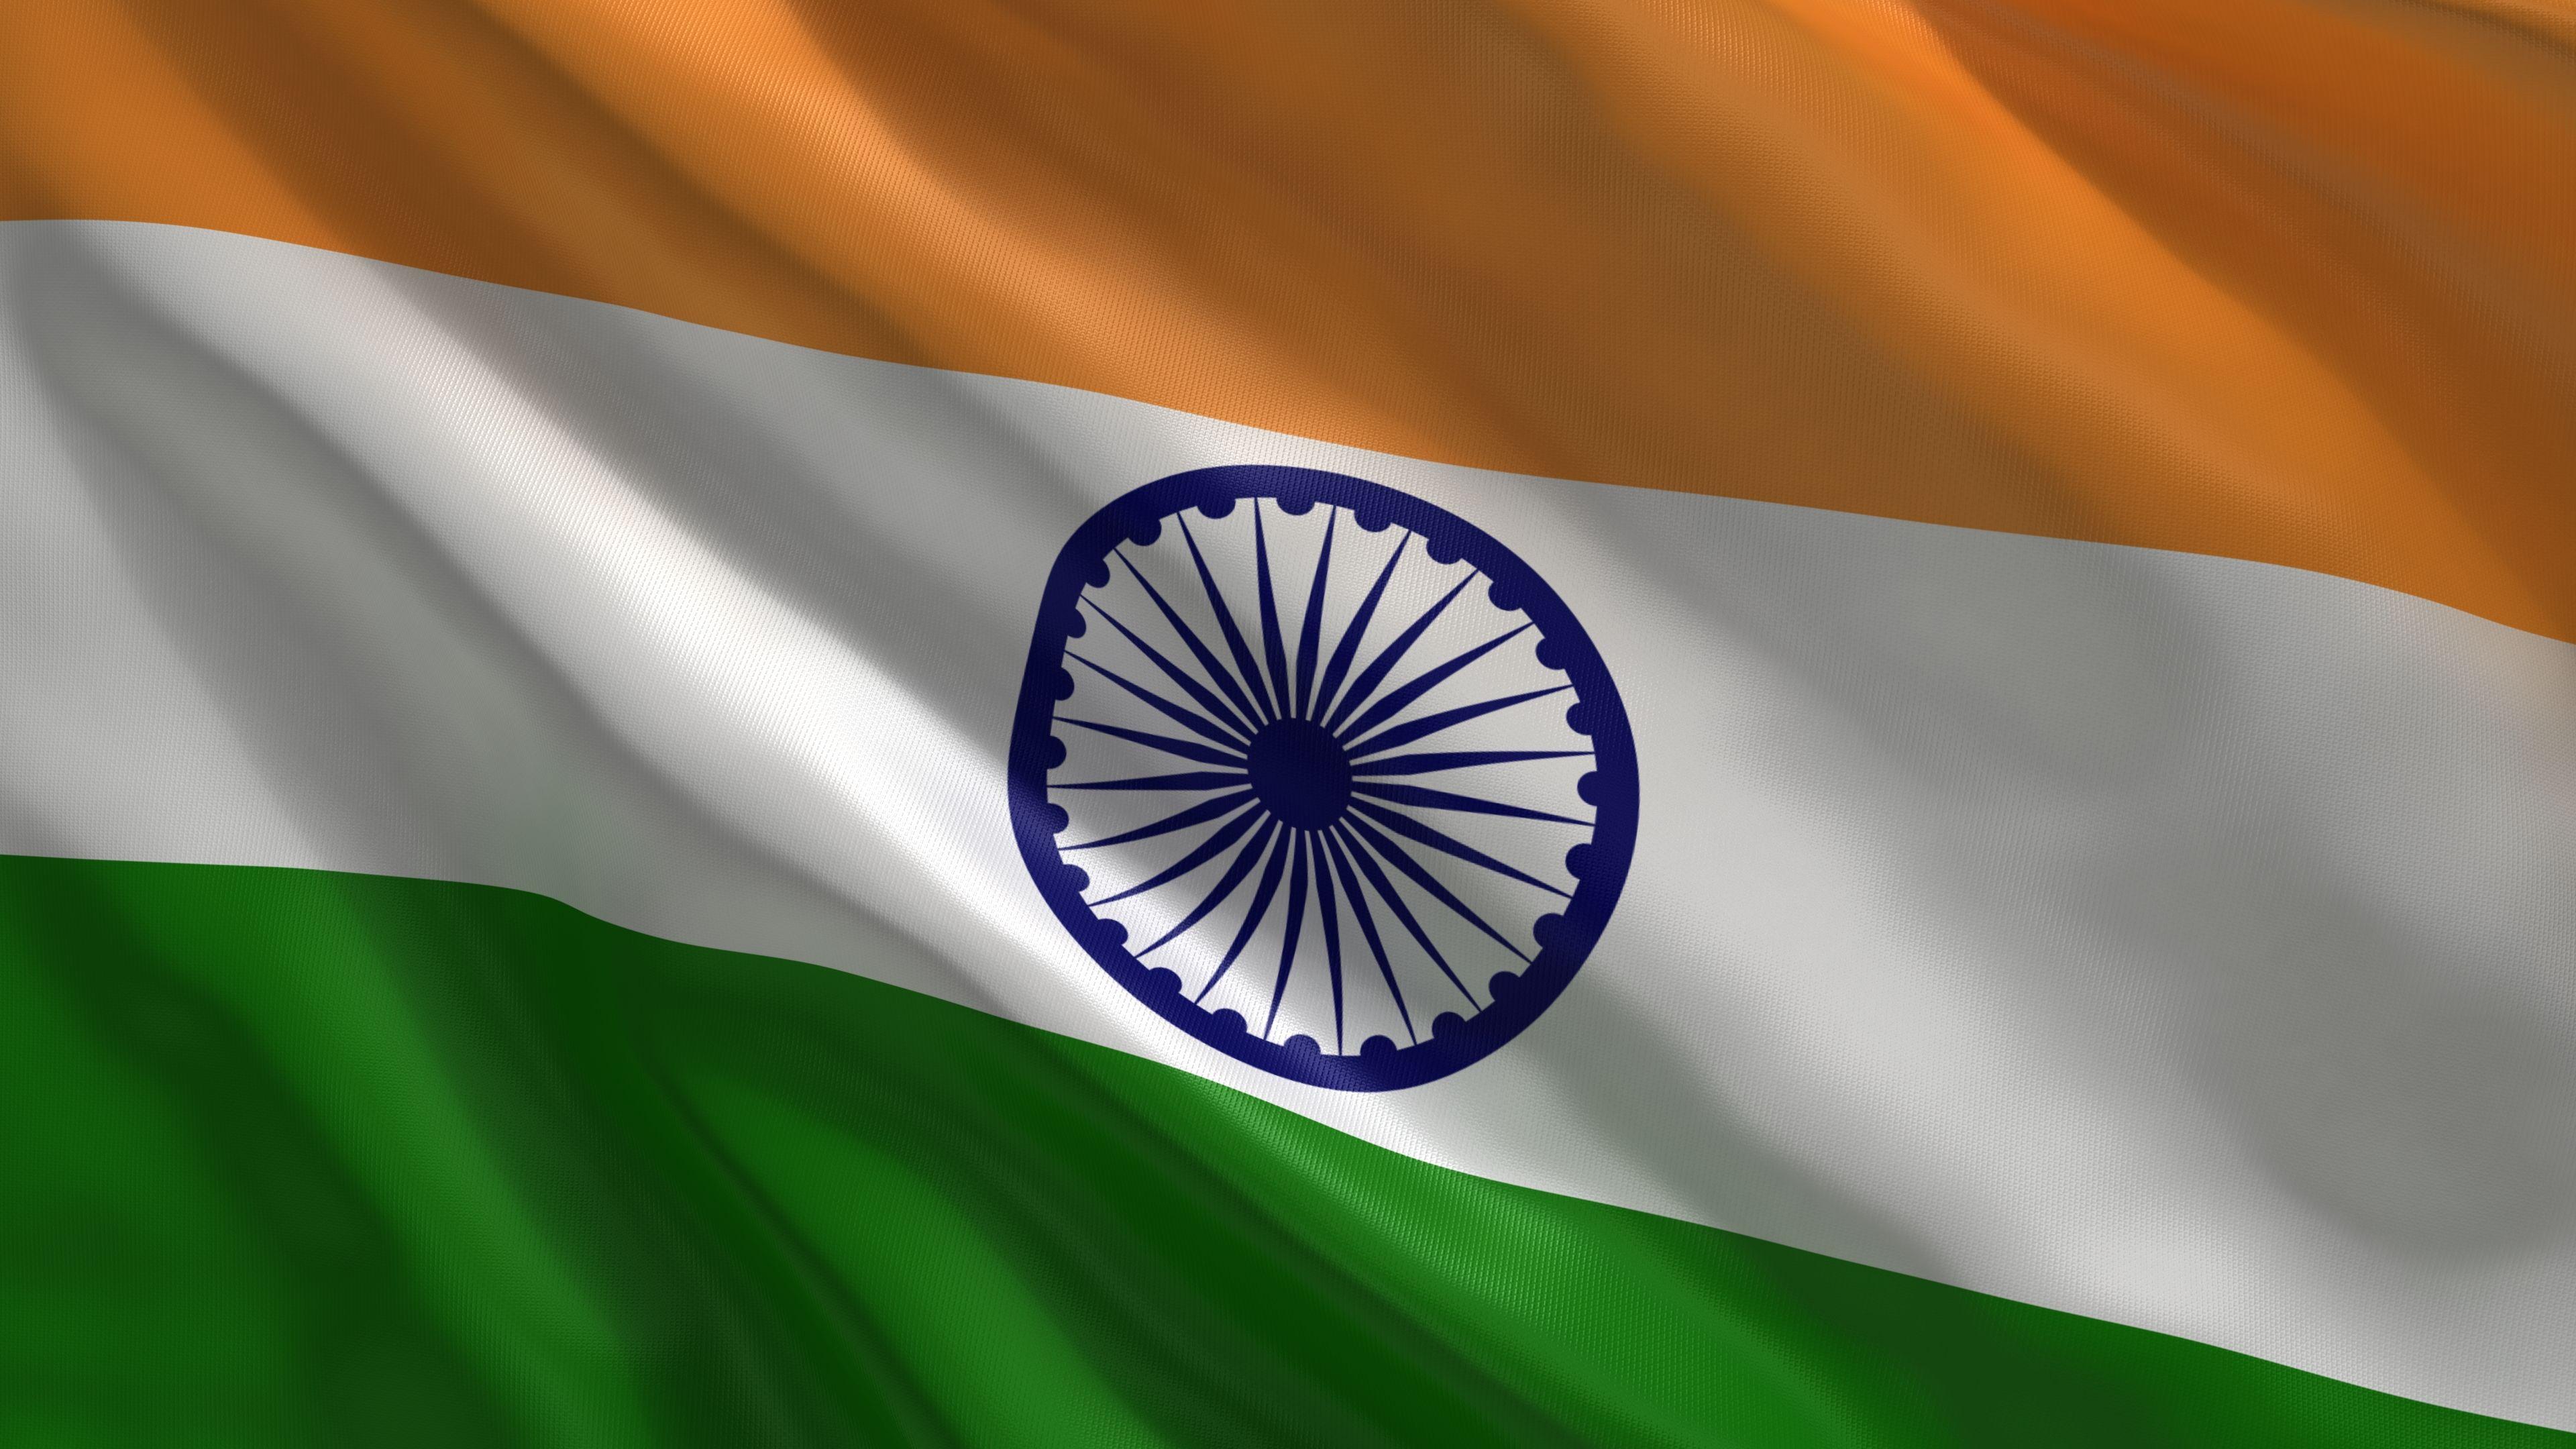 BECAS DE DOCTORADO EN INDIA